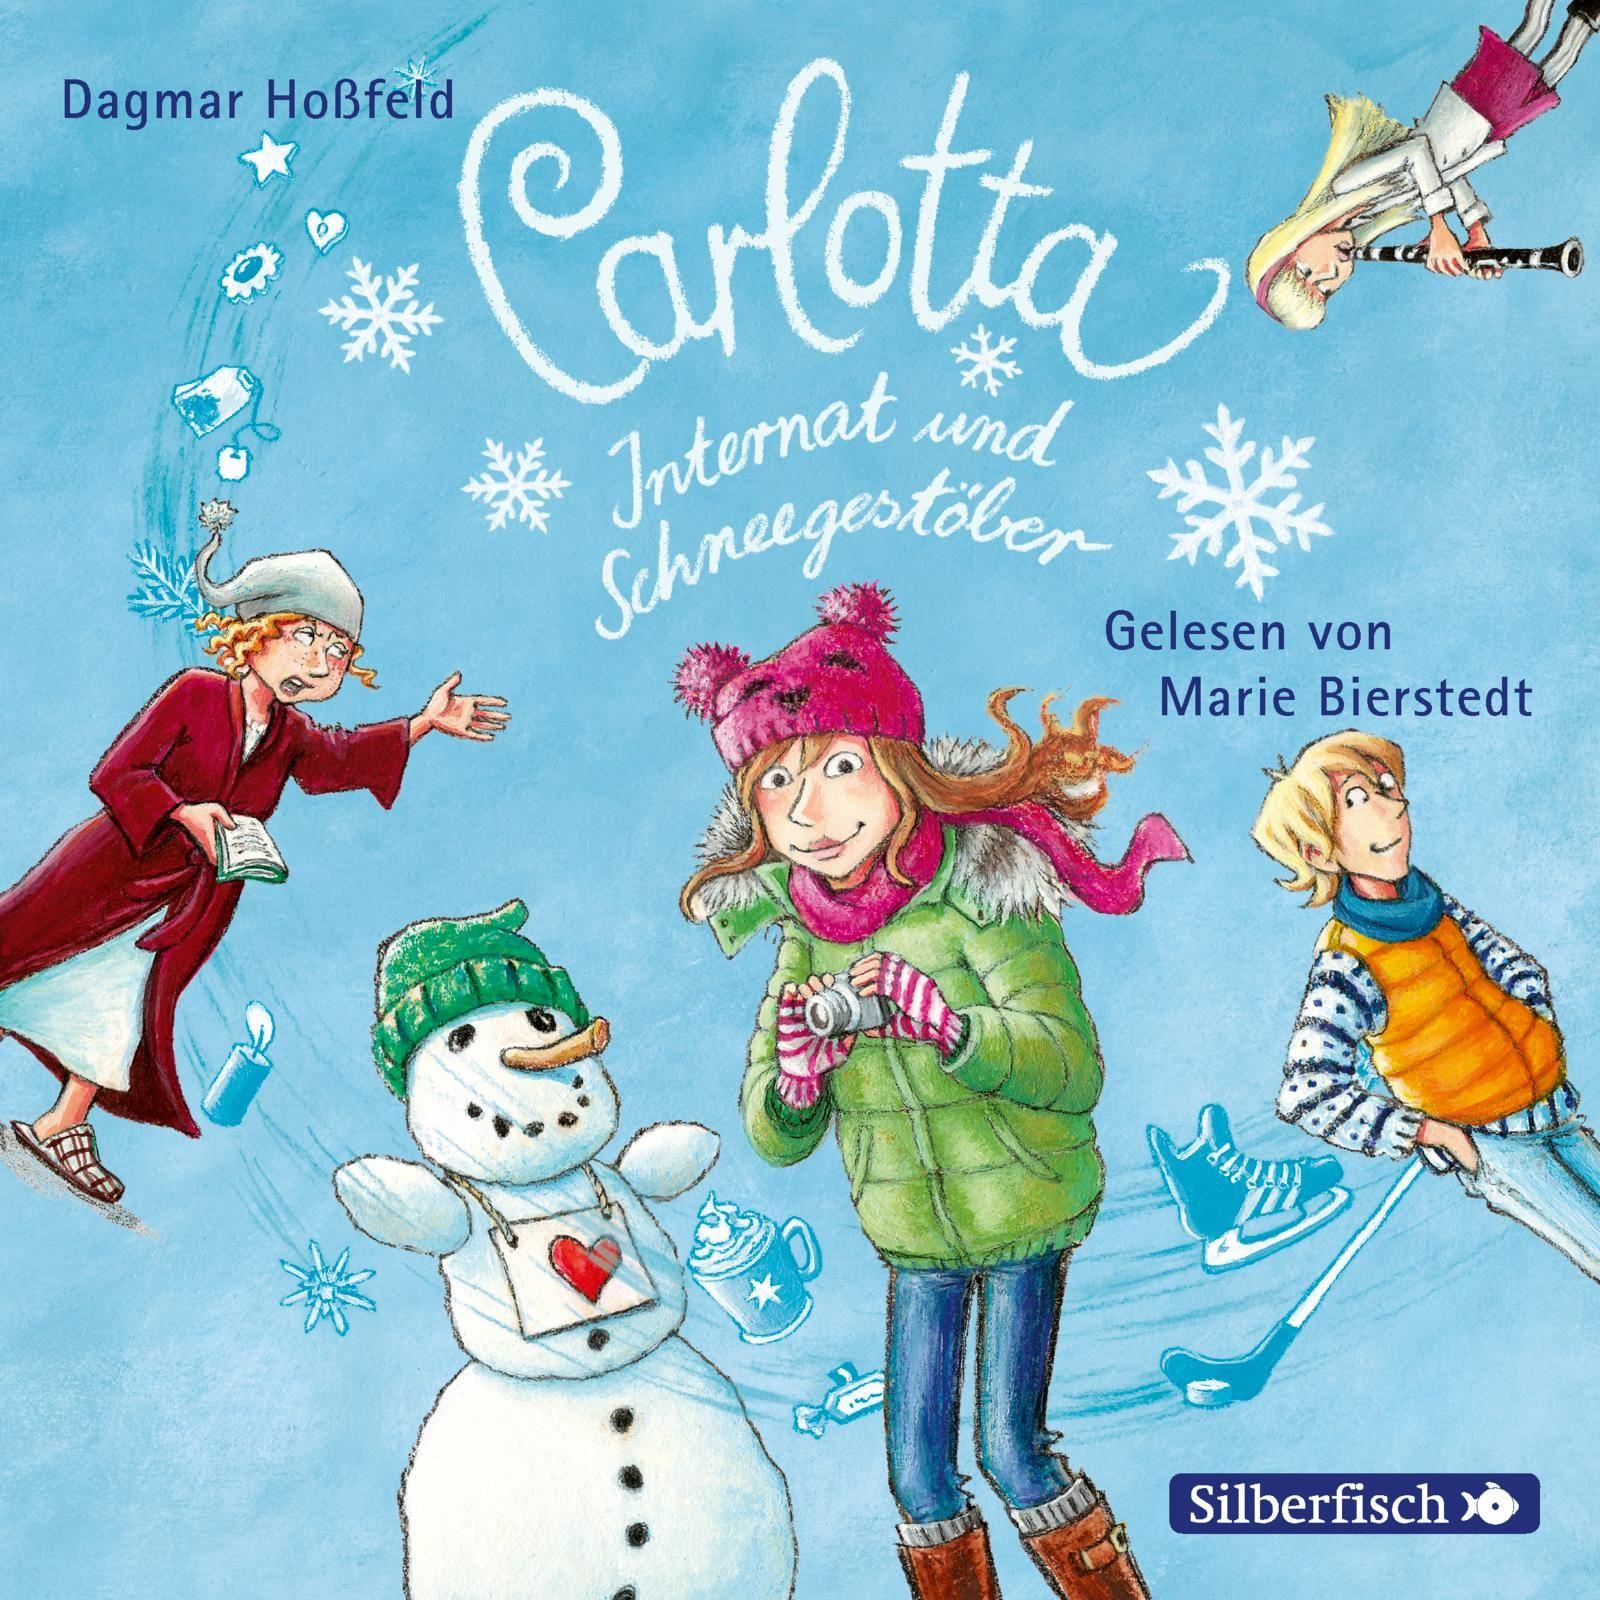 Carlotta Extraband: Internat und Schneegestöber, Dagmar Hoßfeld